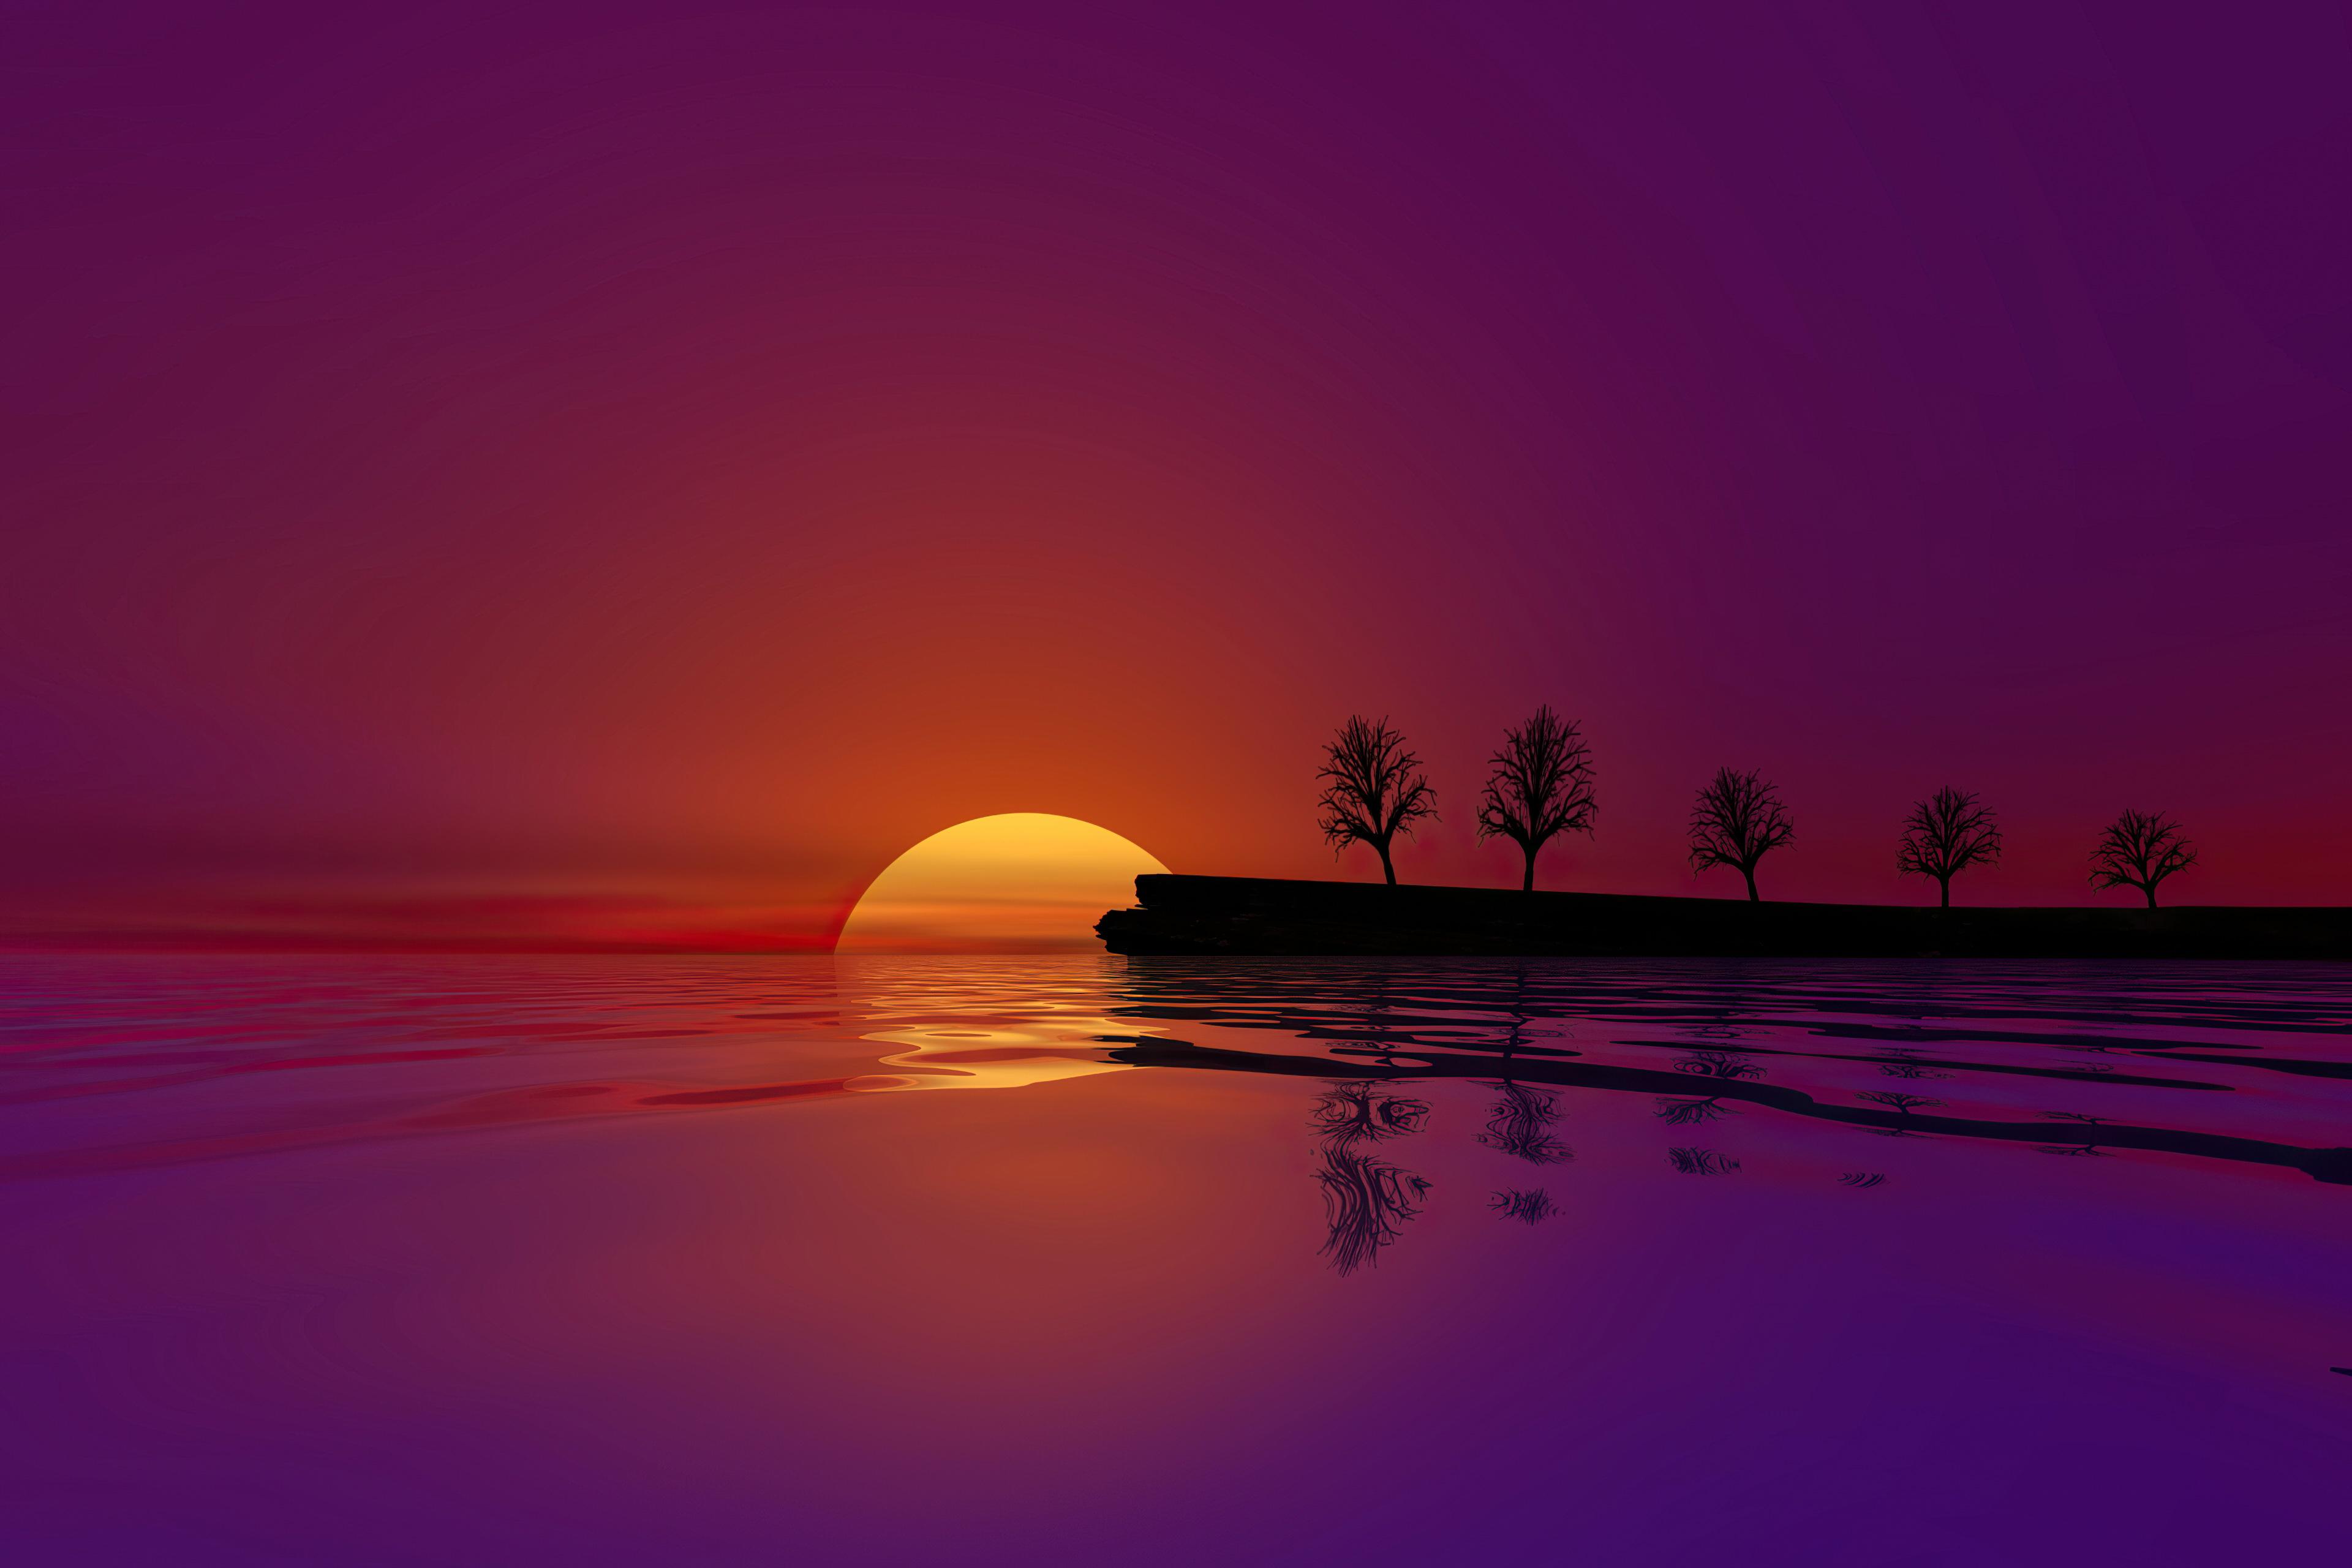 waterscape sunset 4k 1618128873 - Waterscape Sunset 4k - Waterscape Sunset 4k wallpapers